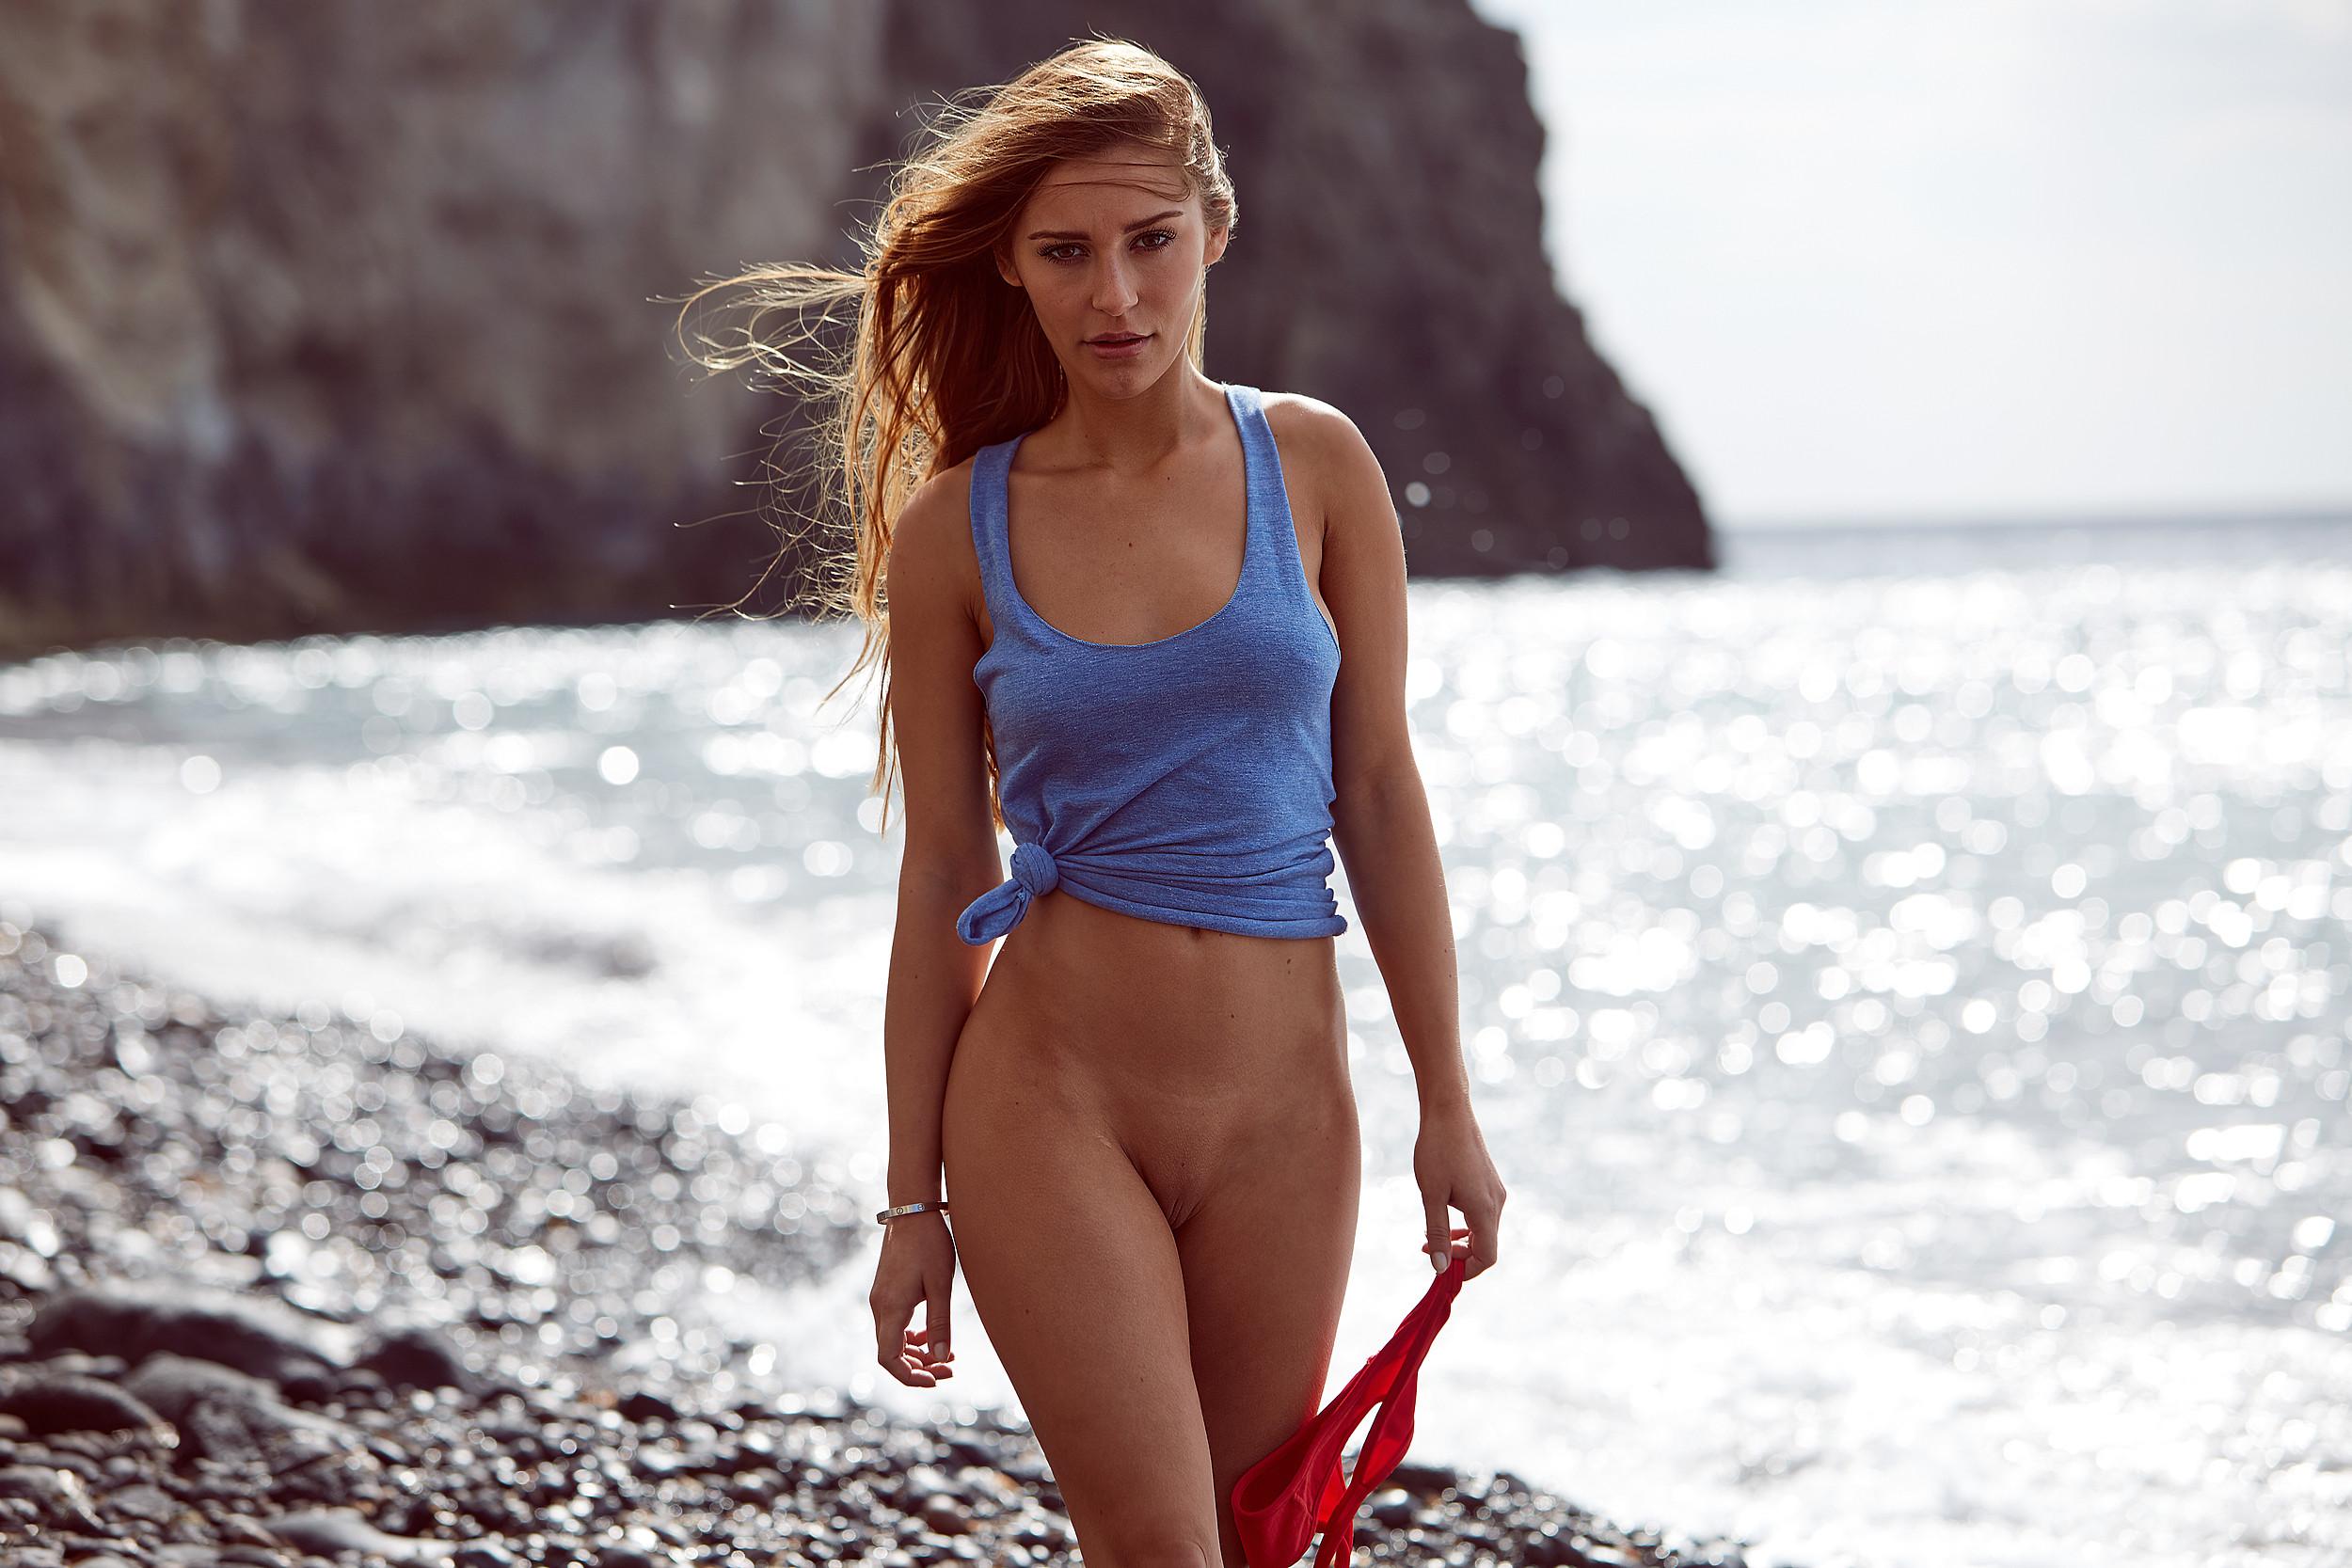 Bikini Kristina Levina nude photos 2019